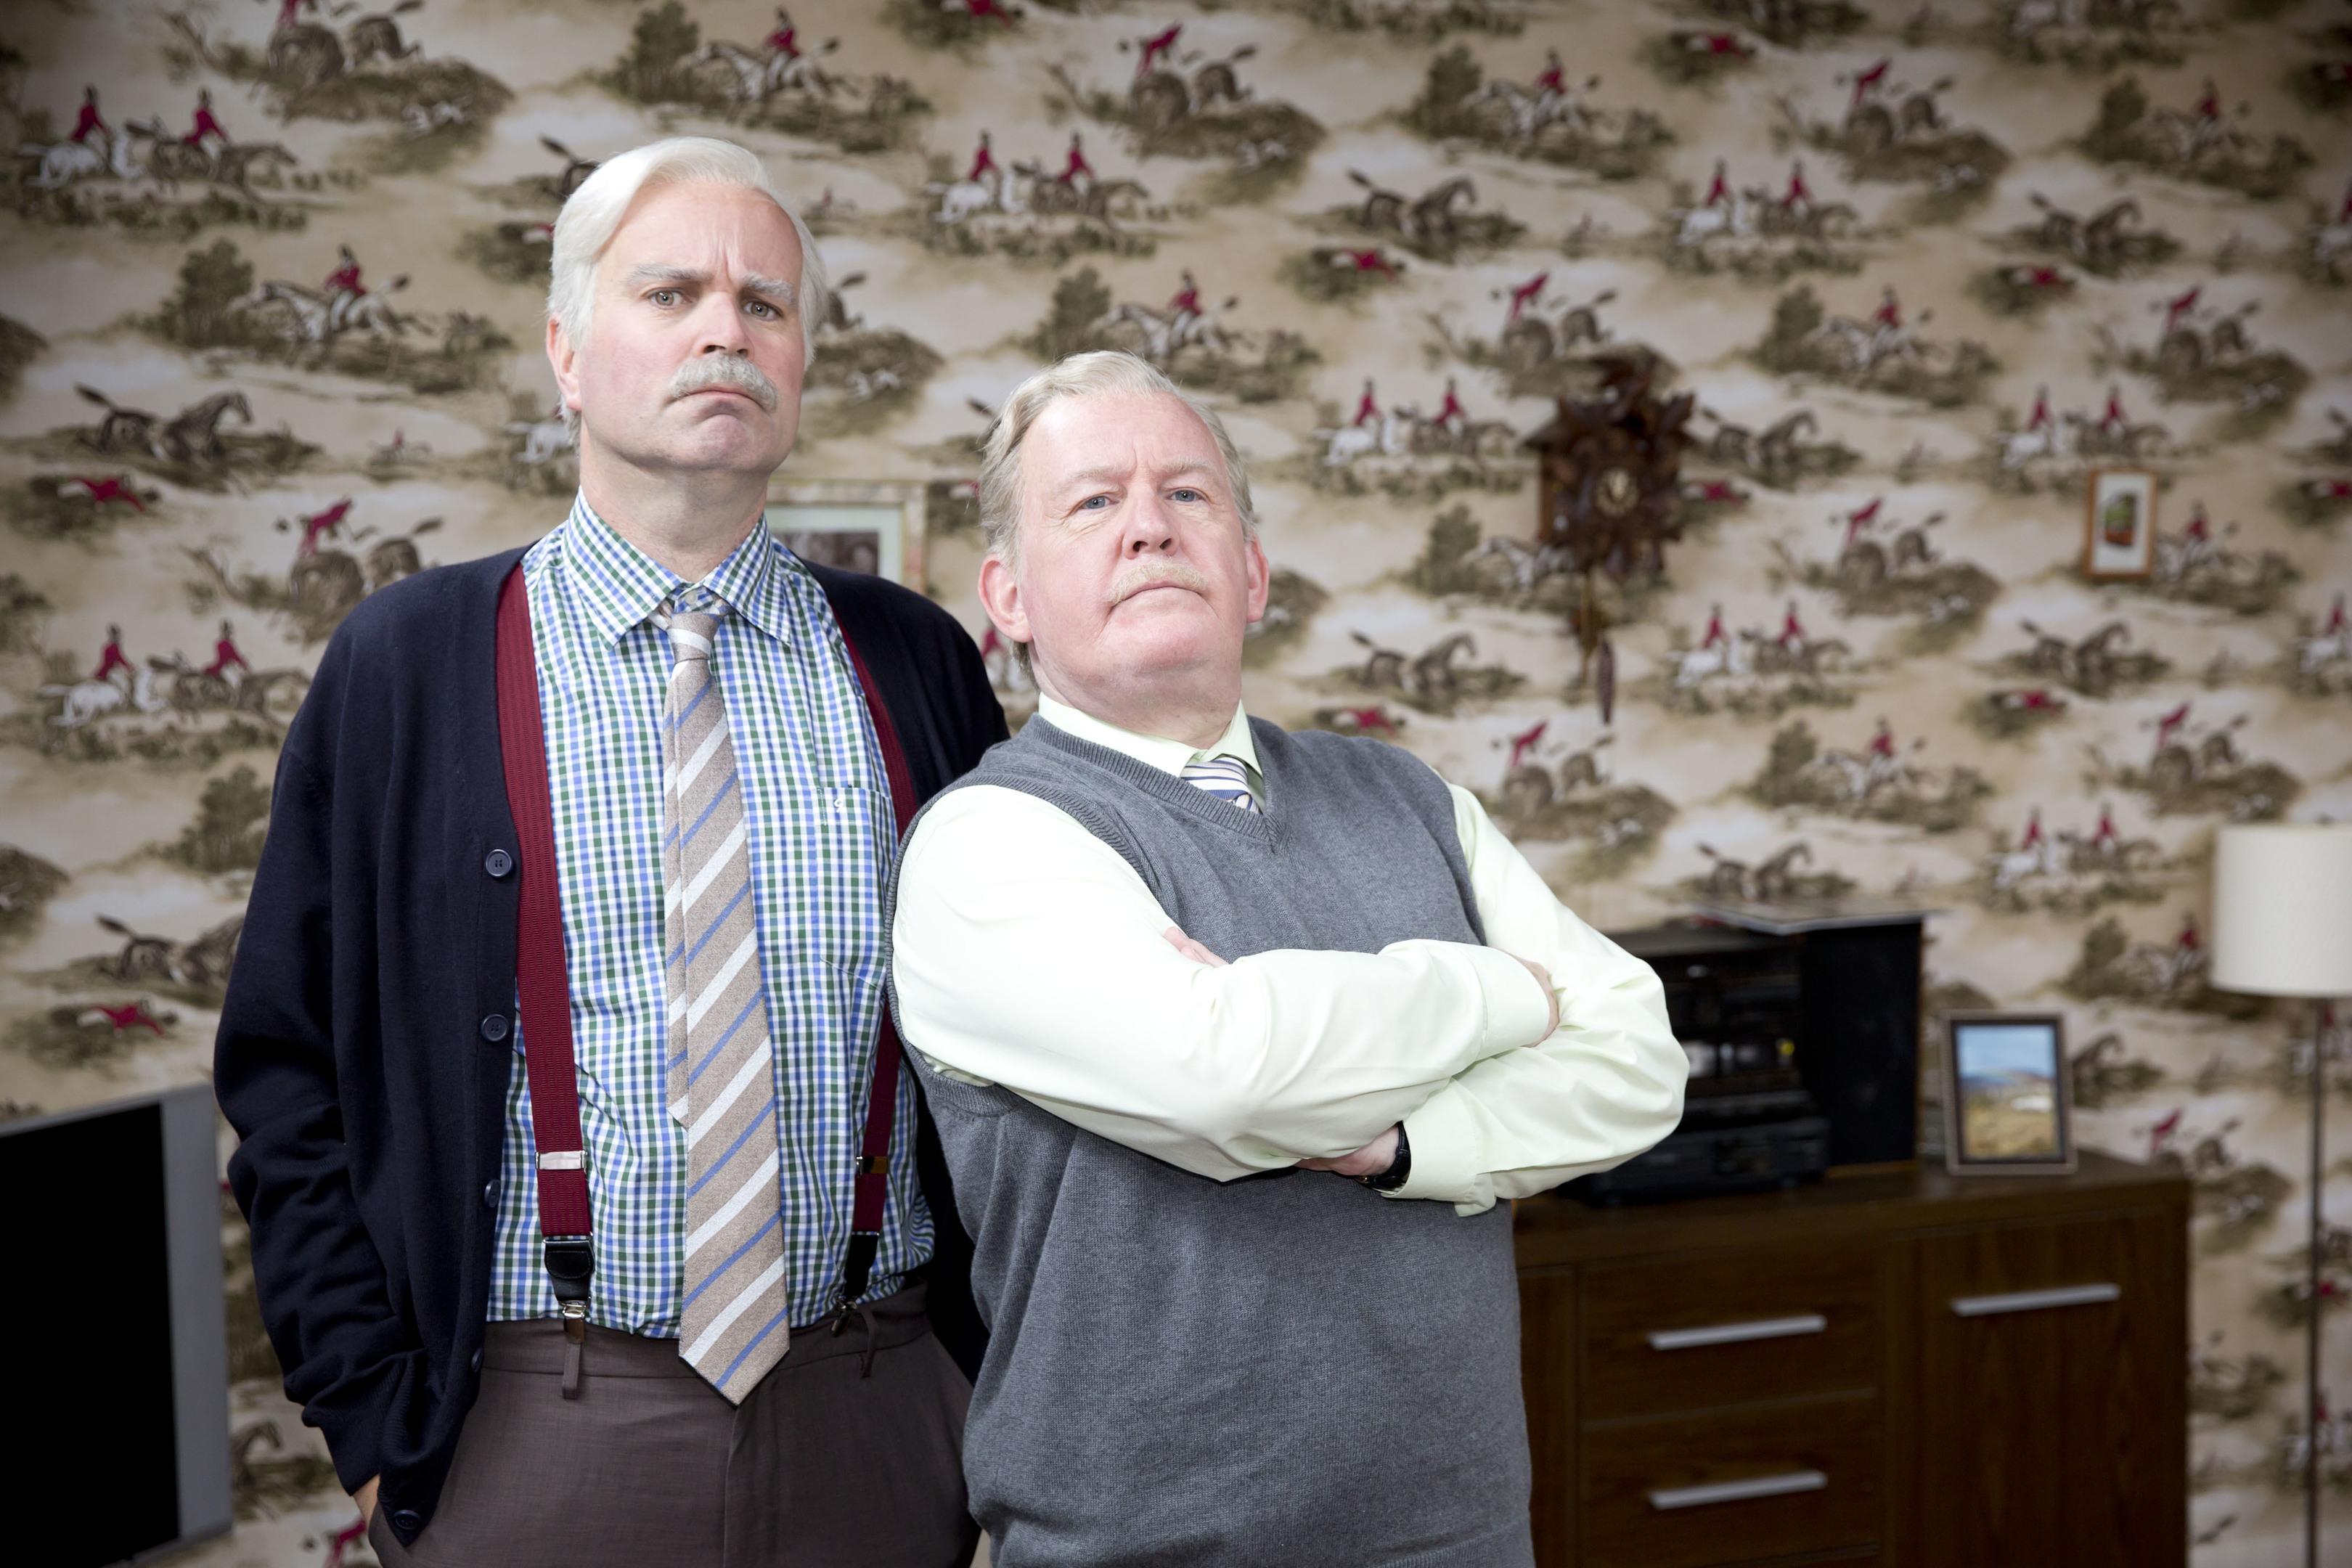 Still Game stars Greg Hemphill and Ford Kiernan (BBC Scotland)